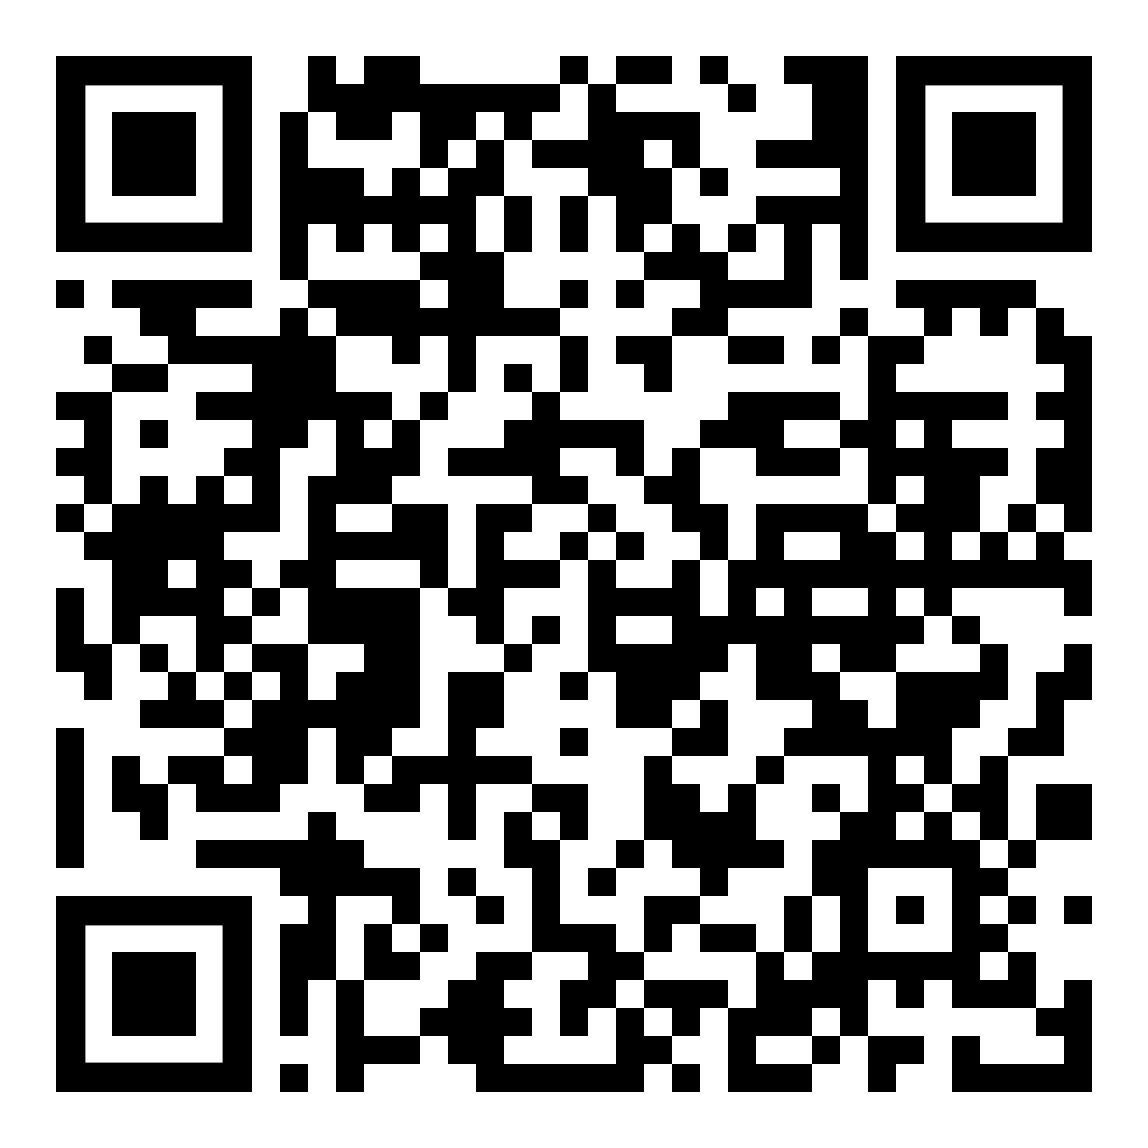 GraniteWMS Warehouse Management QR code